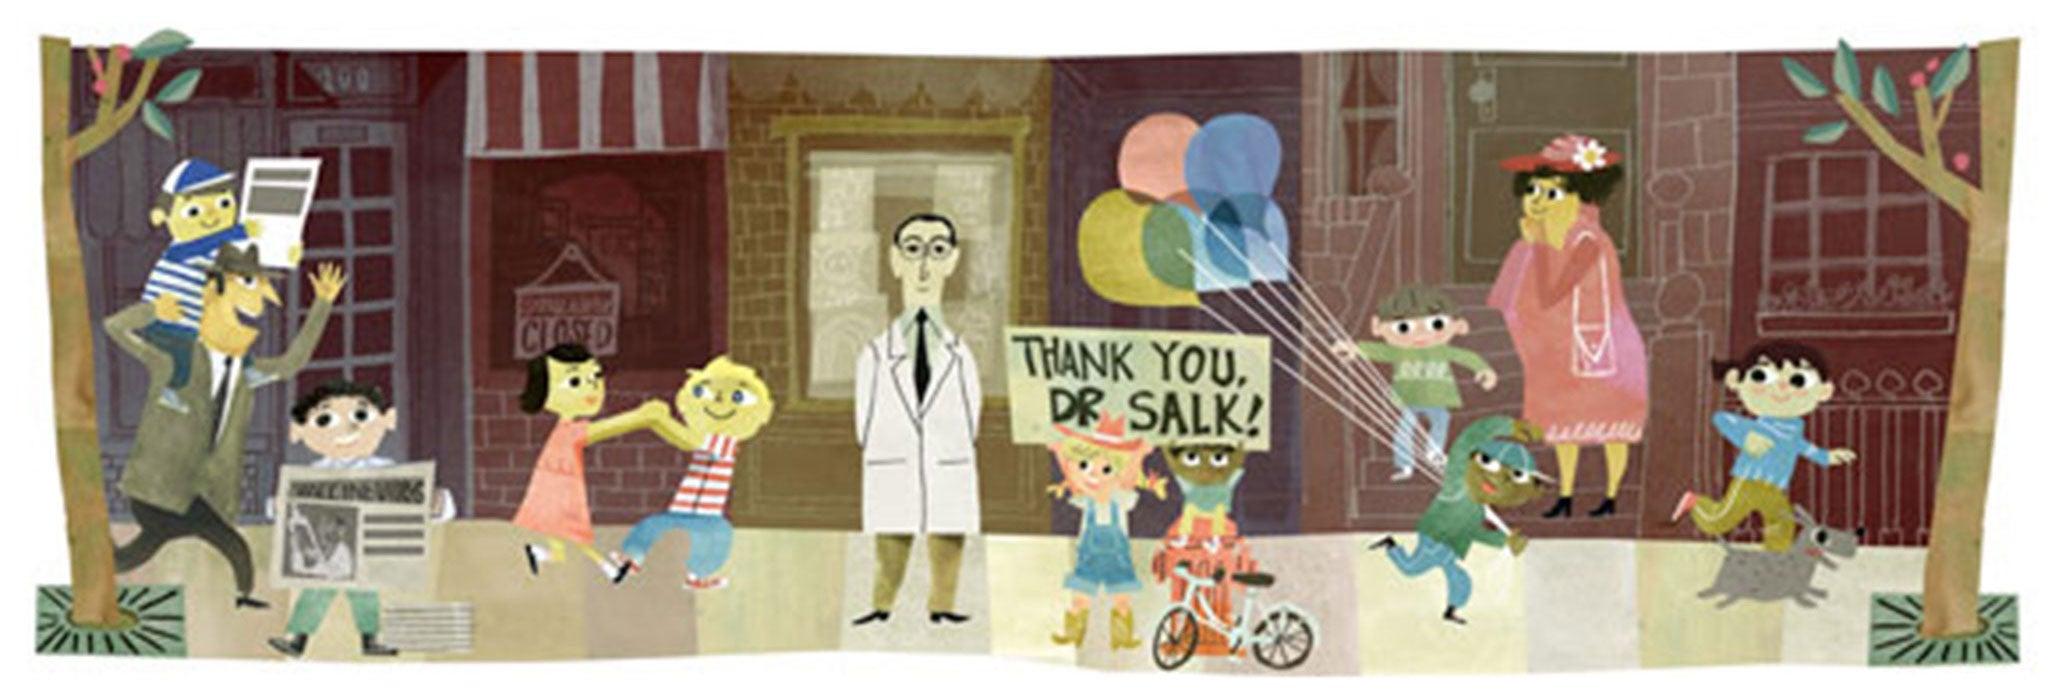 Jonas Salk 100th Birthday: Polio vaccine developer's extraordinary achievement celebrated with a Doodle